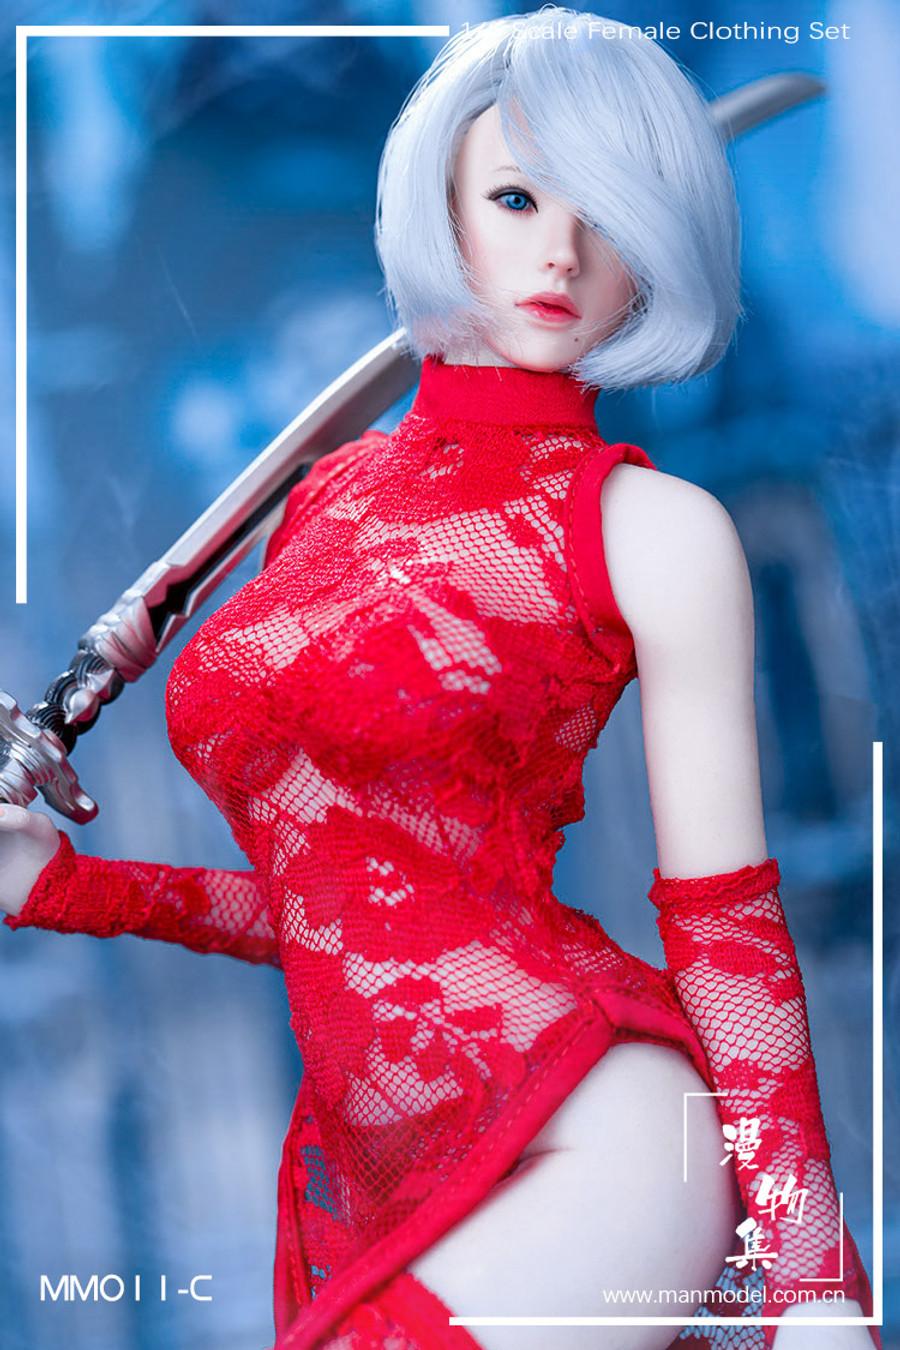 Manmodel - Miss 2B's Lace Cheongsam Set